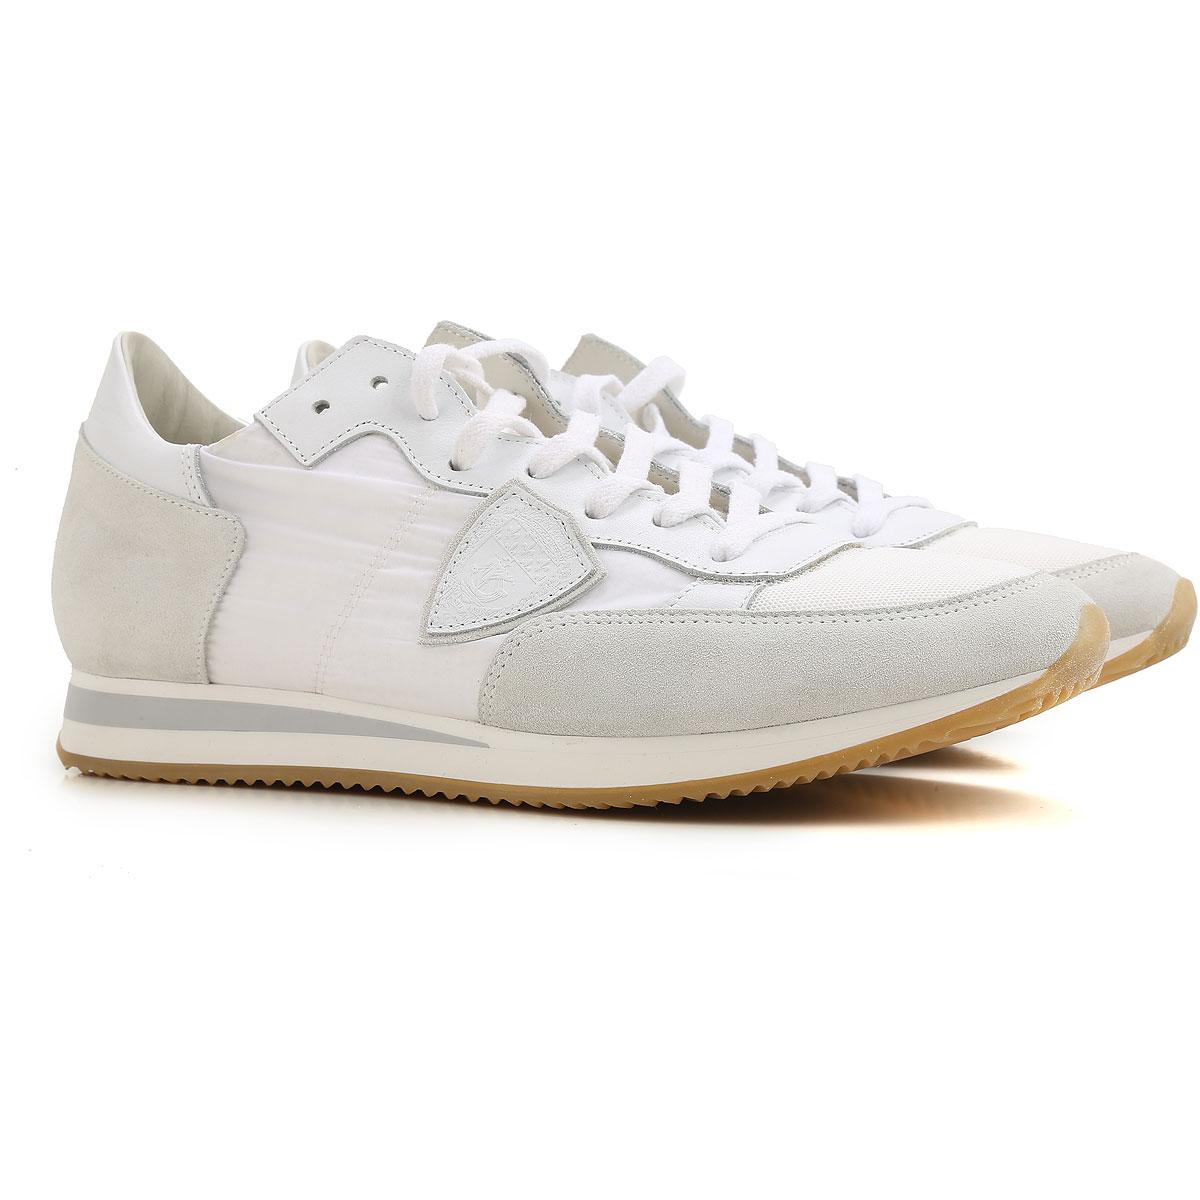 Philippe Model Sneaker Homme Pas cher en Soldes, Blanc, Tissu, 2019, 39 40 41 42 43 44